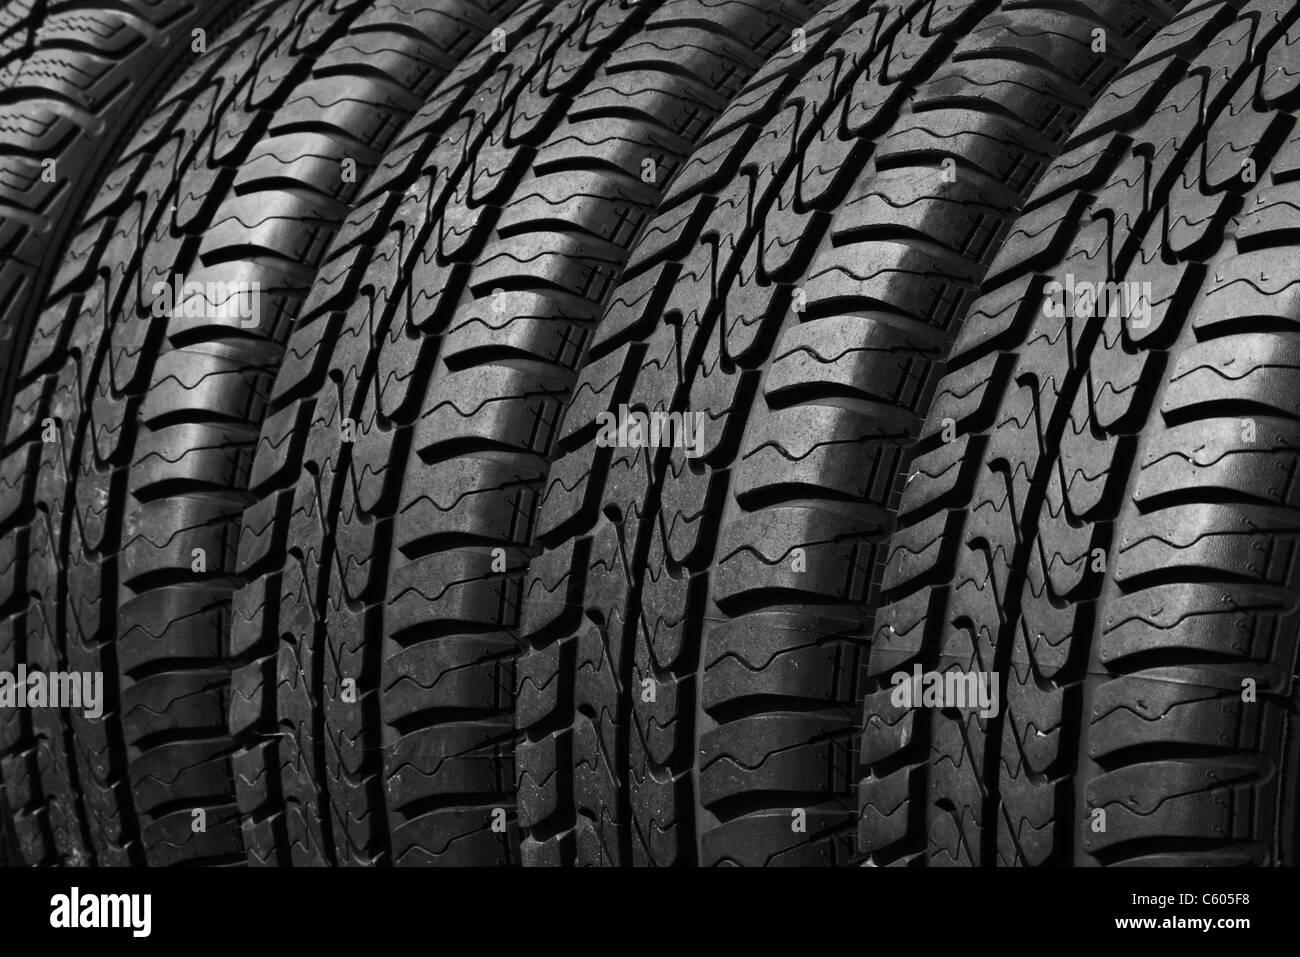 Cerrar vista de neumáticos de coche Imagen De Stock